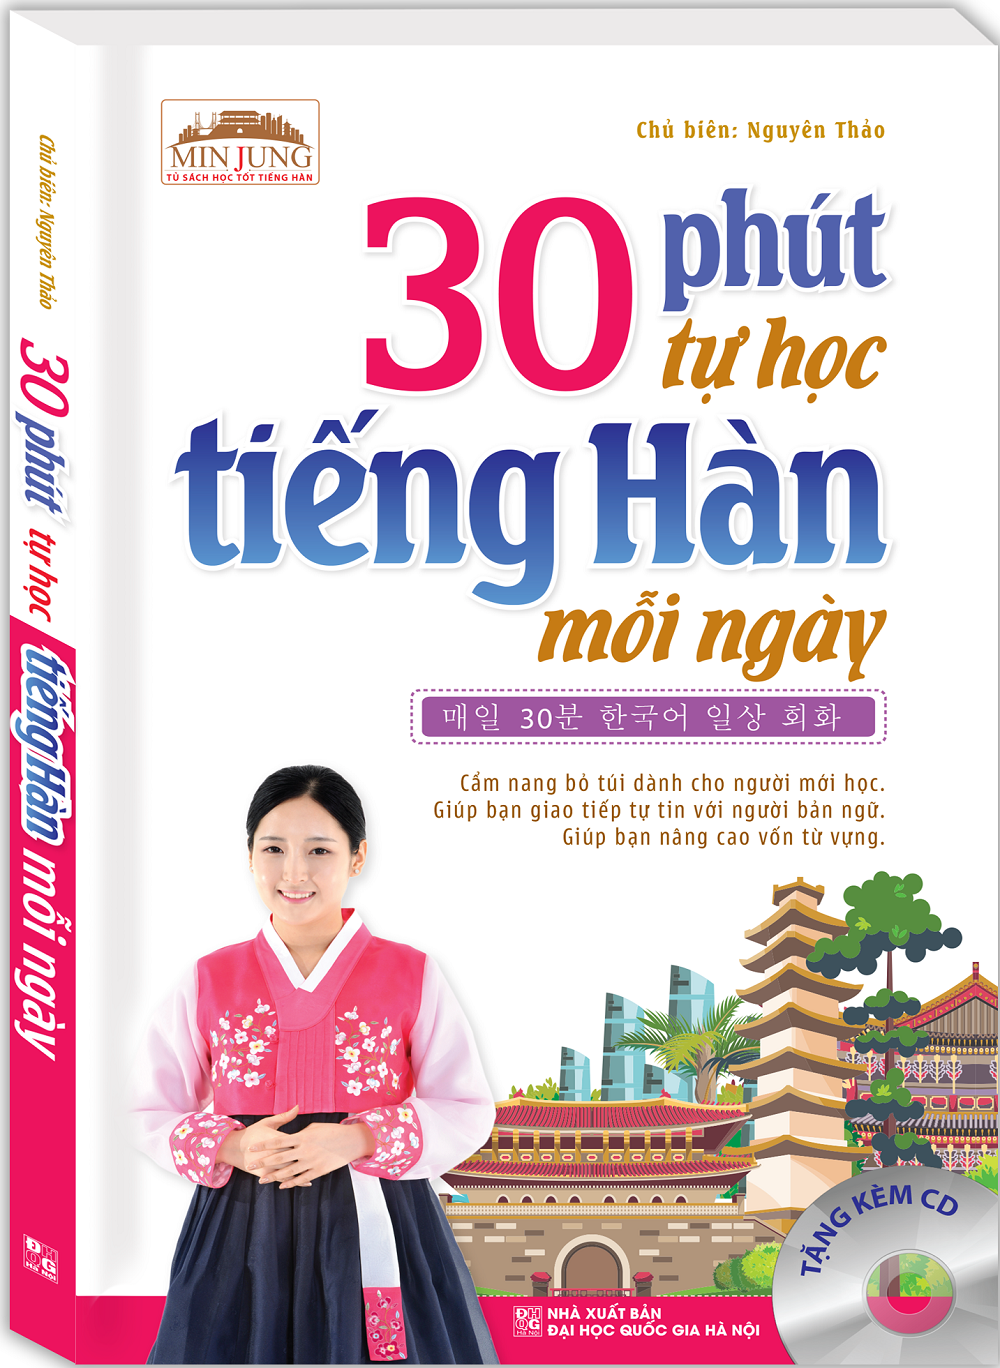 30-phut-tu-hoc-tieng-han-moi-ngay-80k.u2469.d20161121.t081430.205311.png